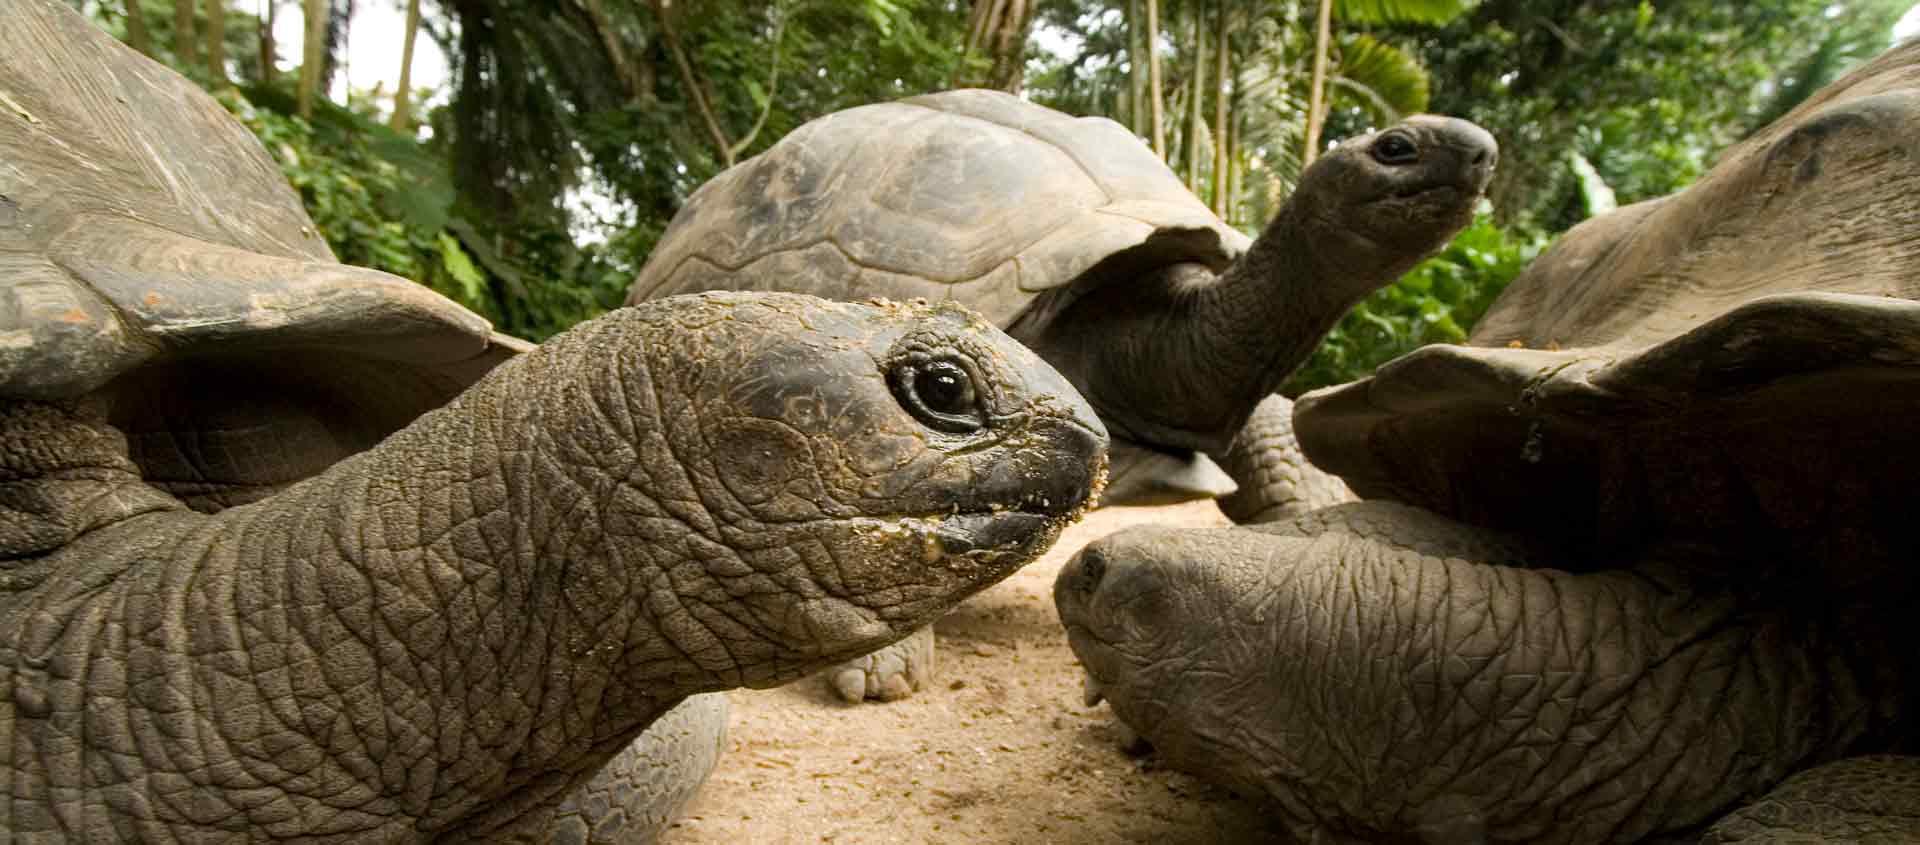 Seychelles Islands cruise image showing Aldabra Giant Tortoises